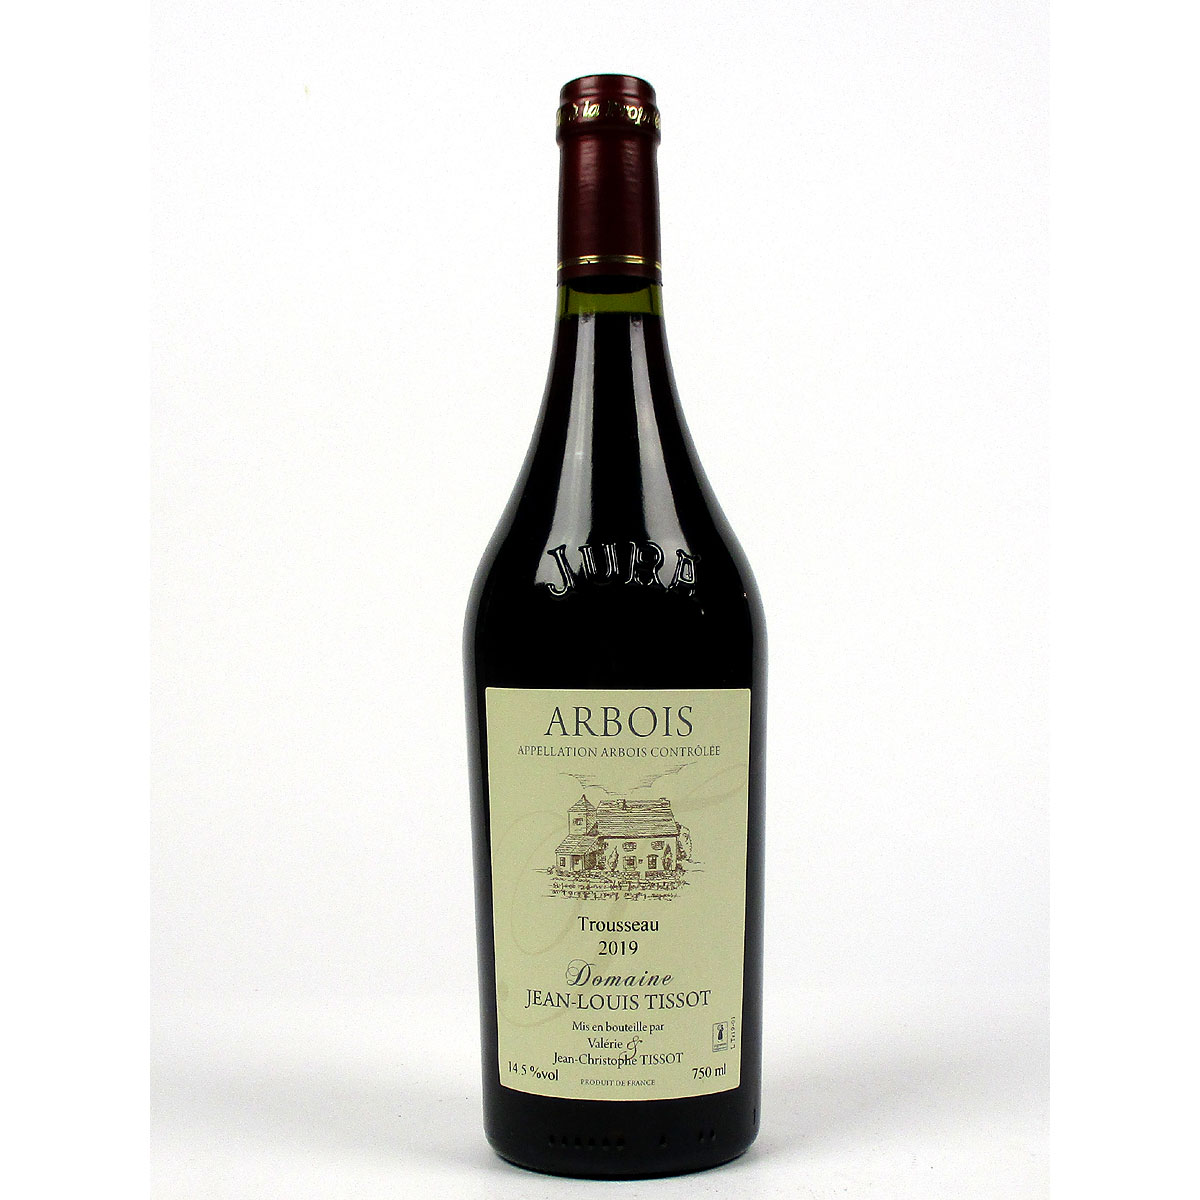 Jura Arbois: Trousseau Domaine Jean-Louis Tissot 2019 - Bottle